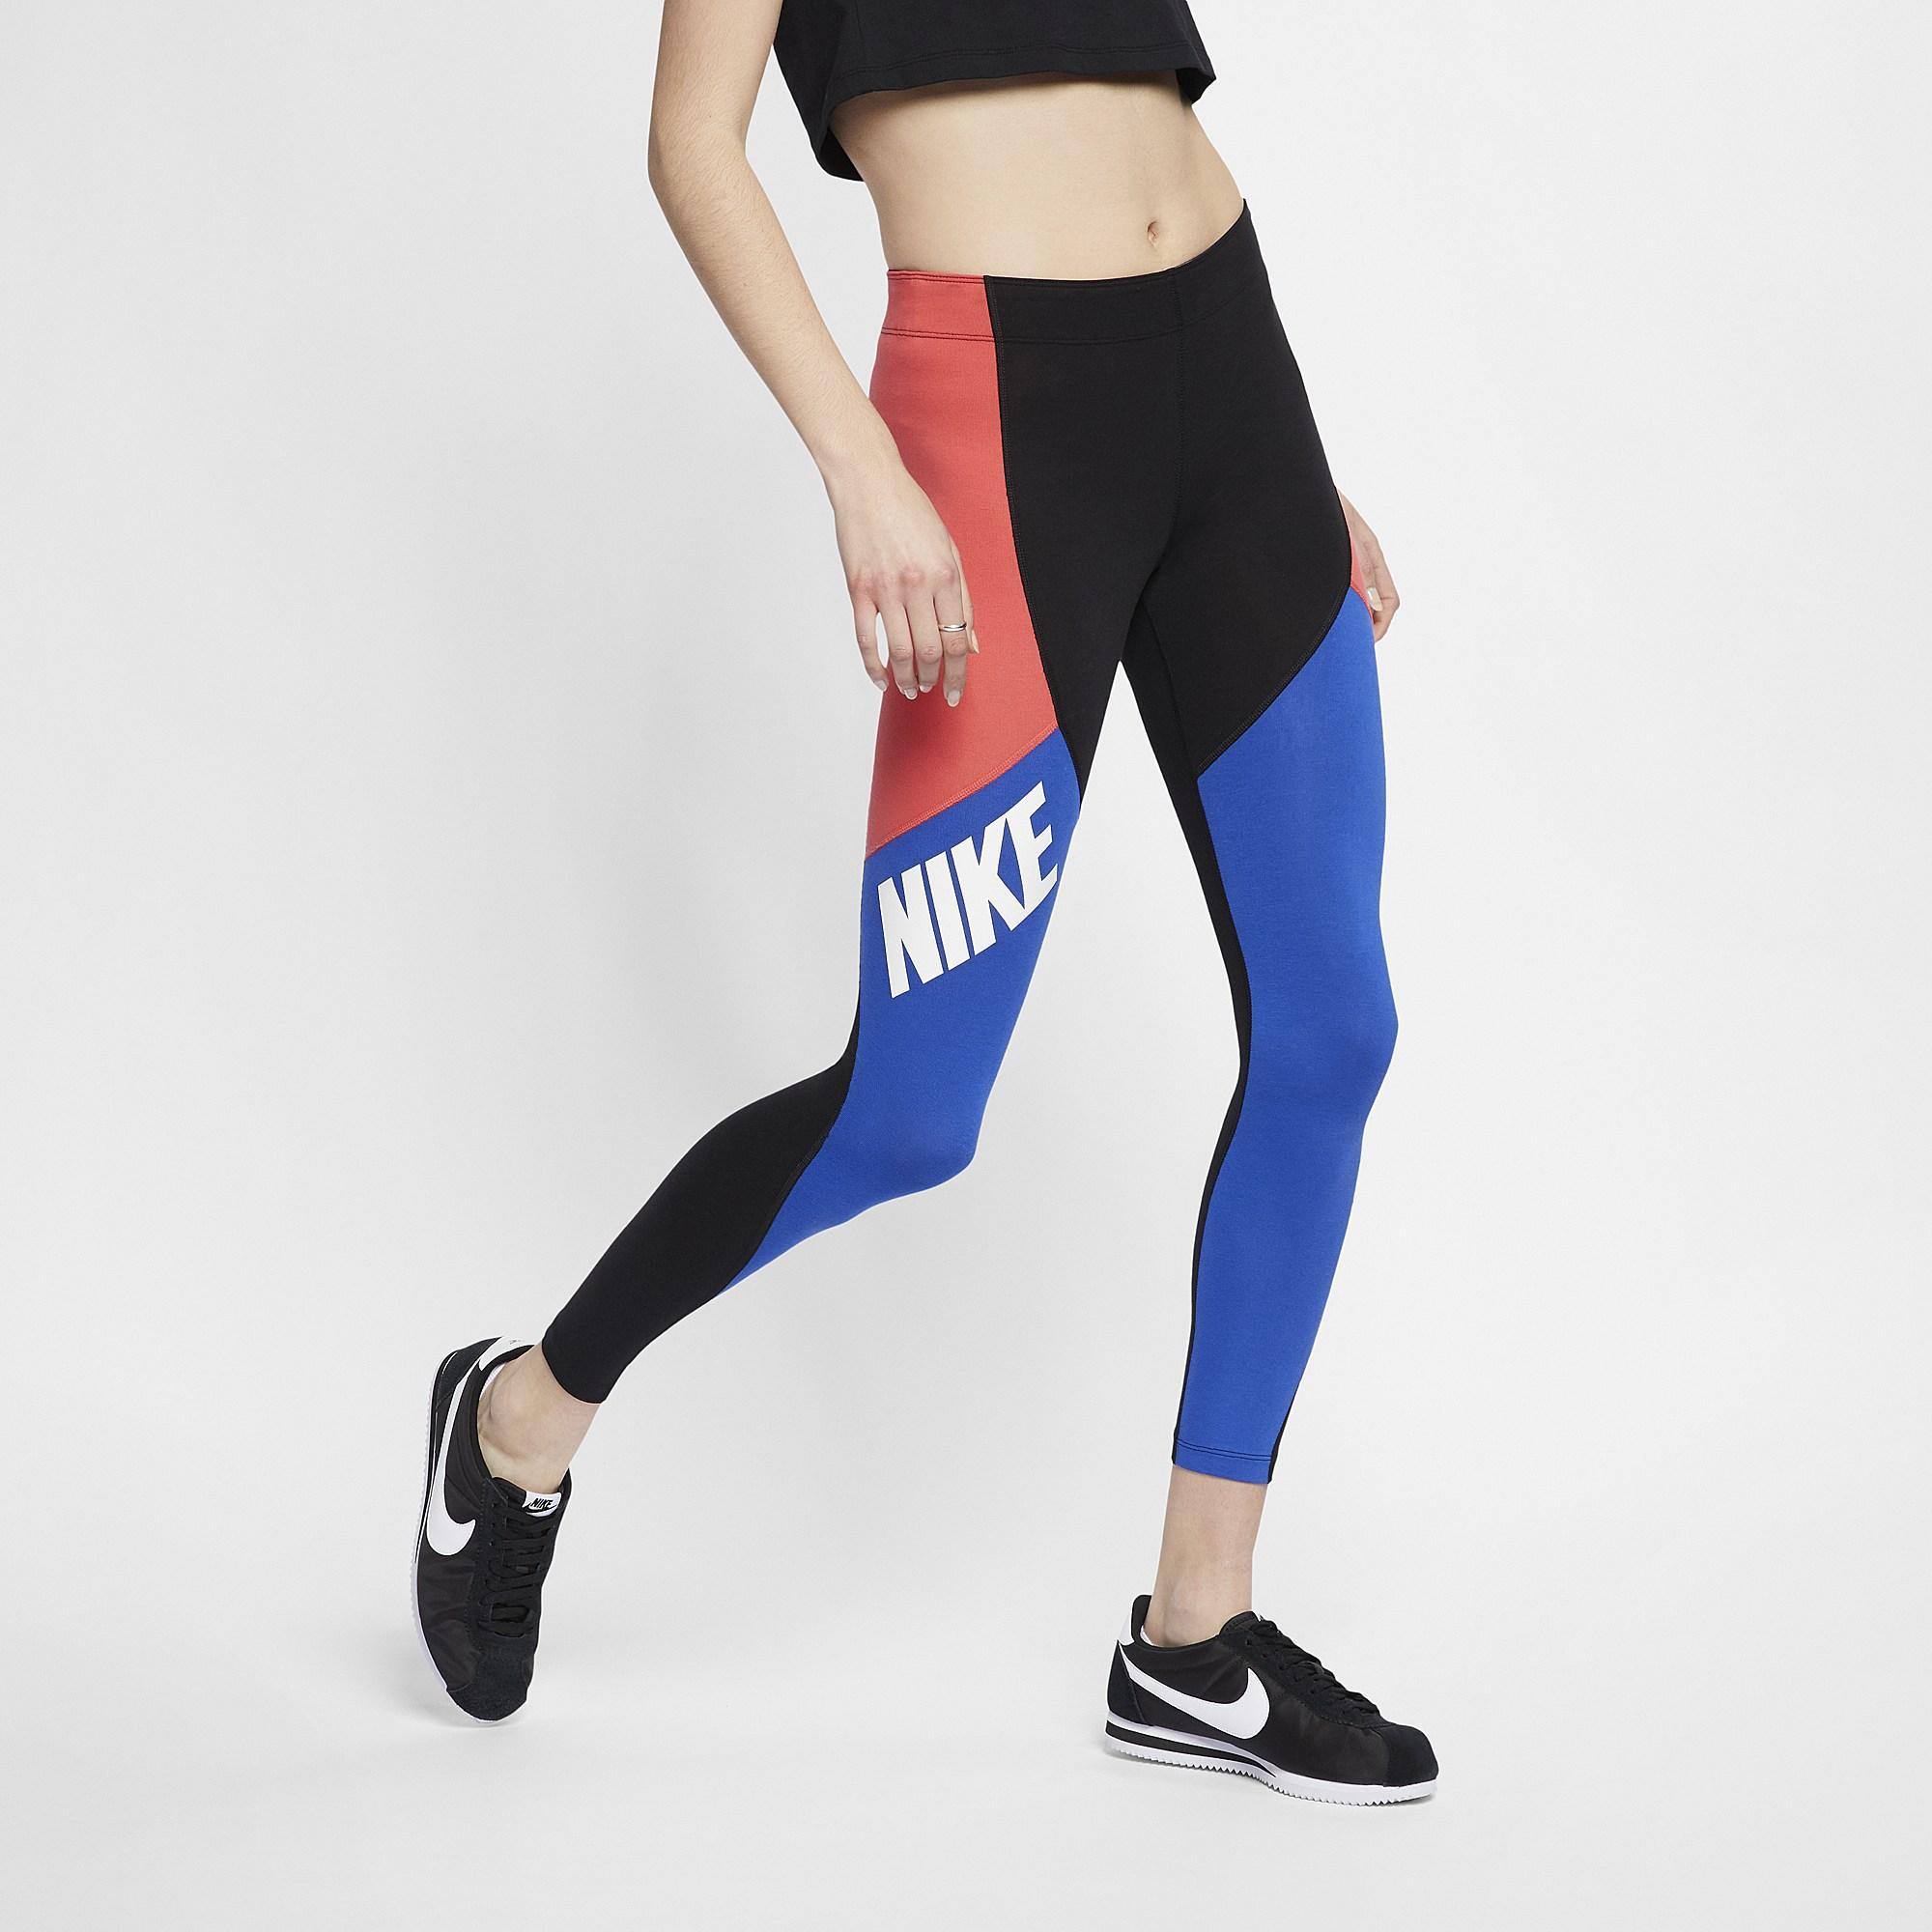 20db1427cde8a Nike. Women's Sport Distort Colorblock Leggings